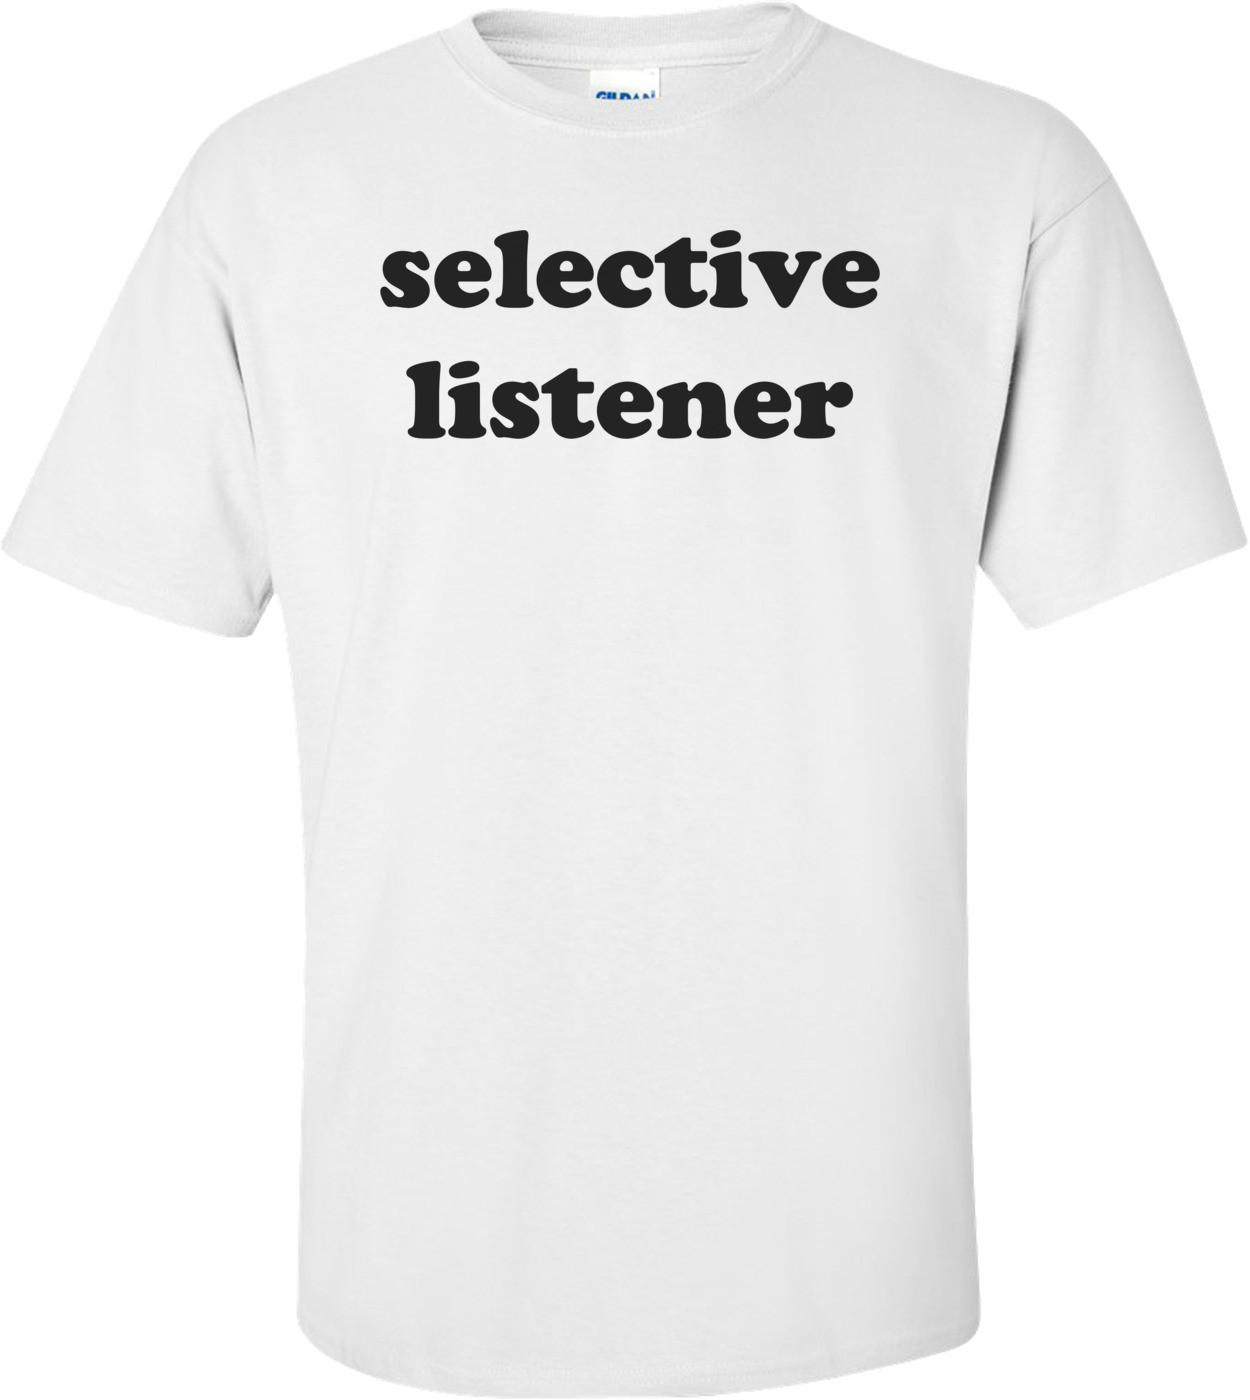 selective listener Shirt